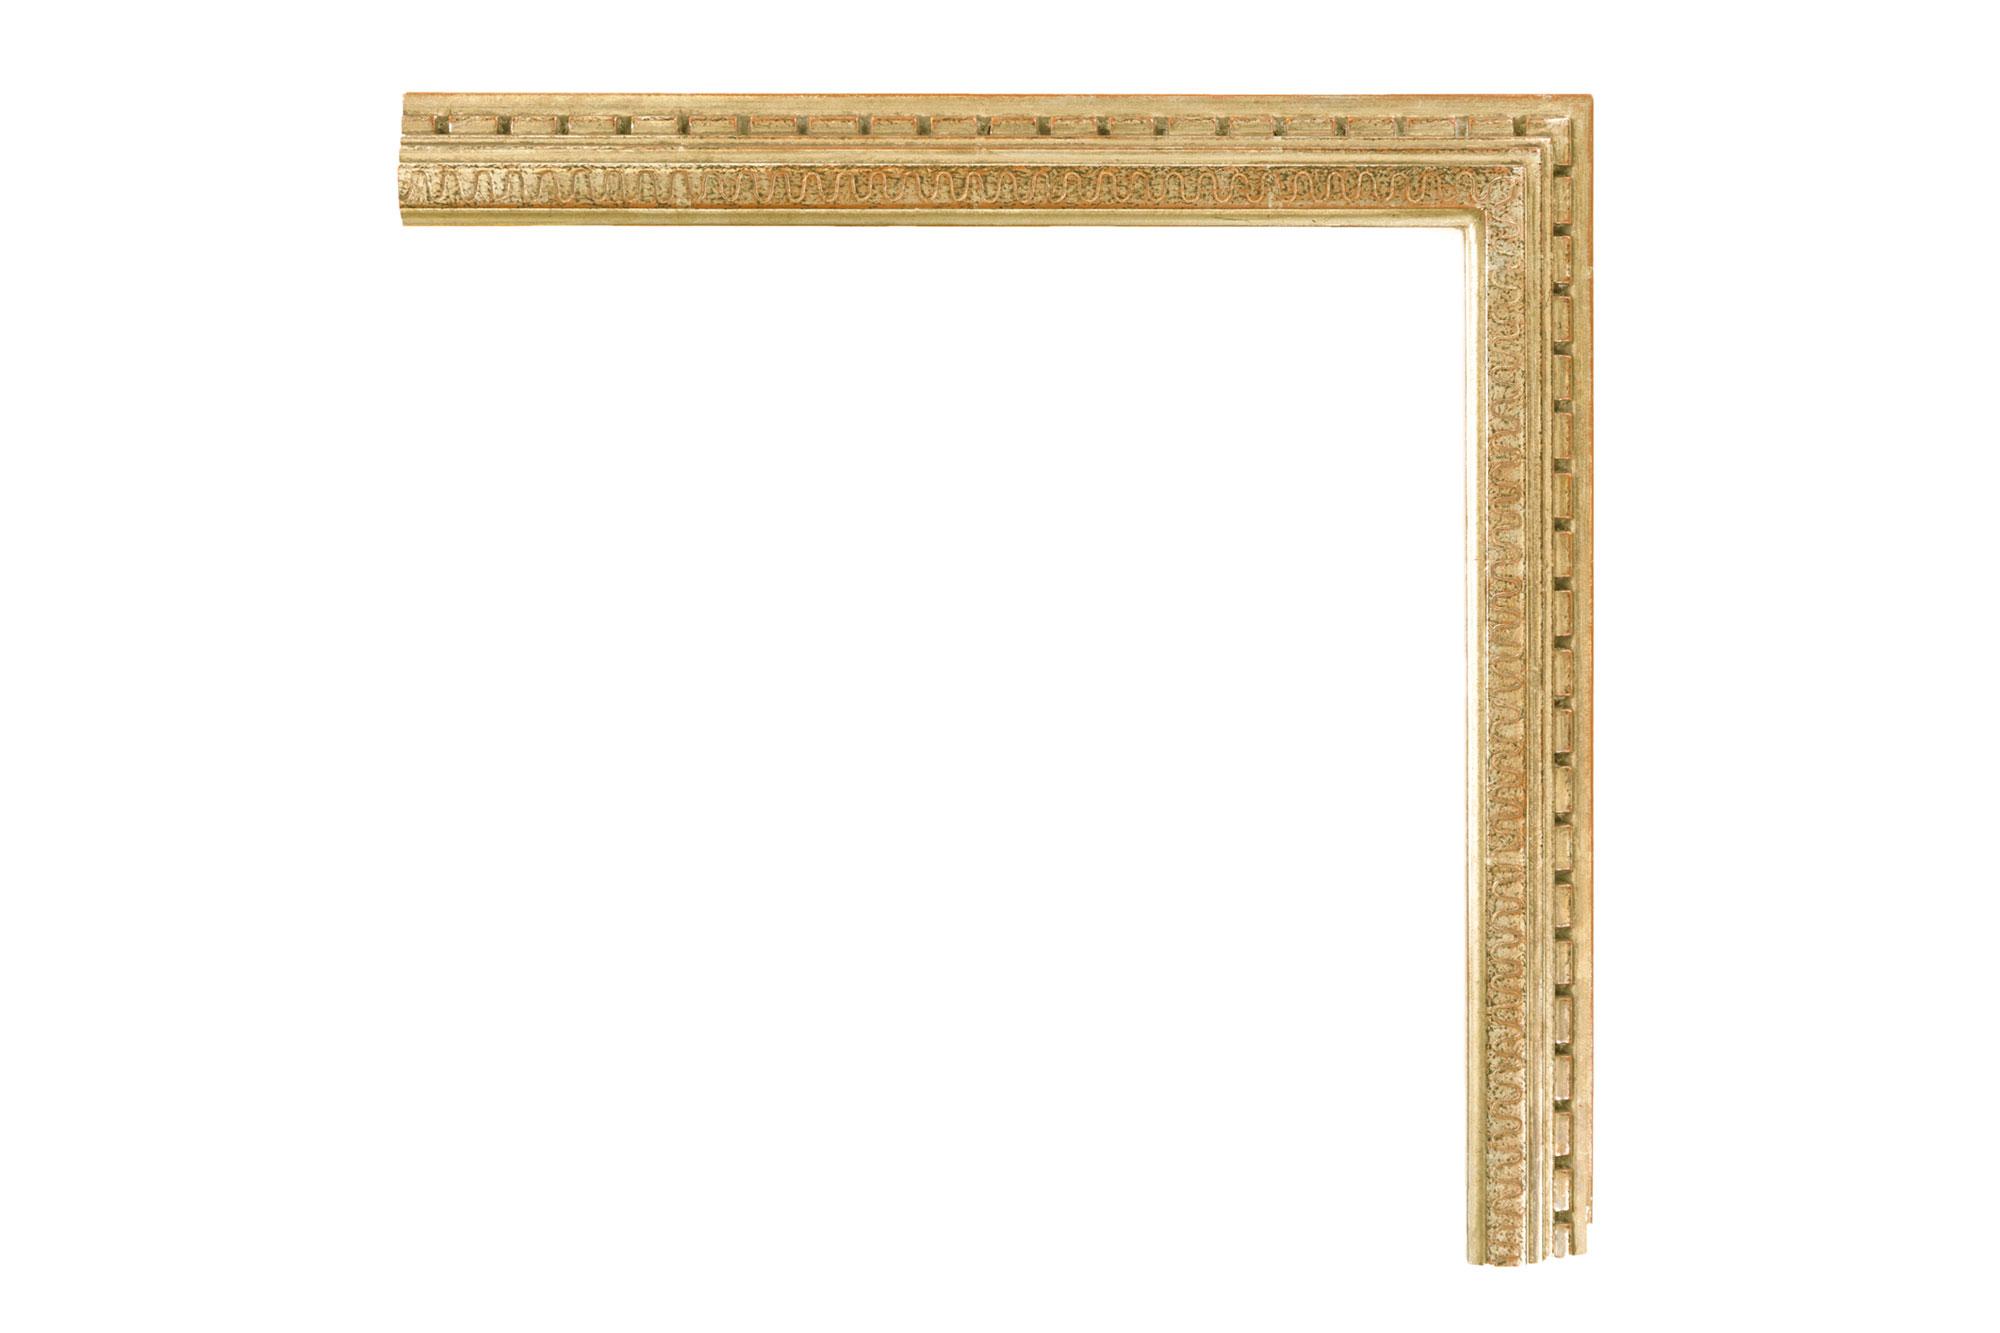 "Bernard Badura Gold  1 1/2"" Badura-inspired Warm White Gold, Engraved panel, Dental design around perimeter"